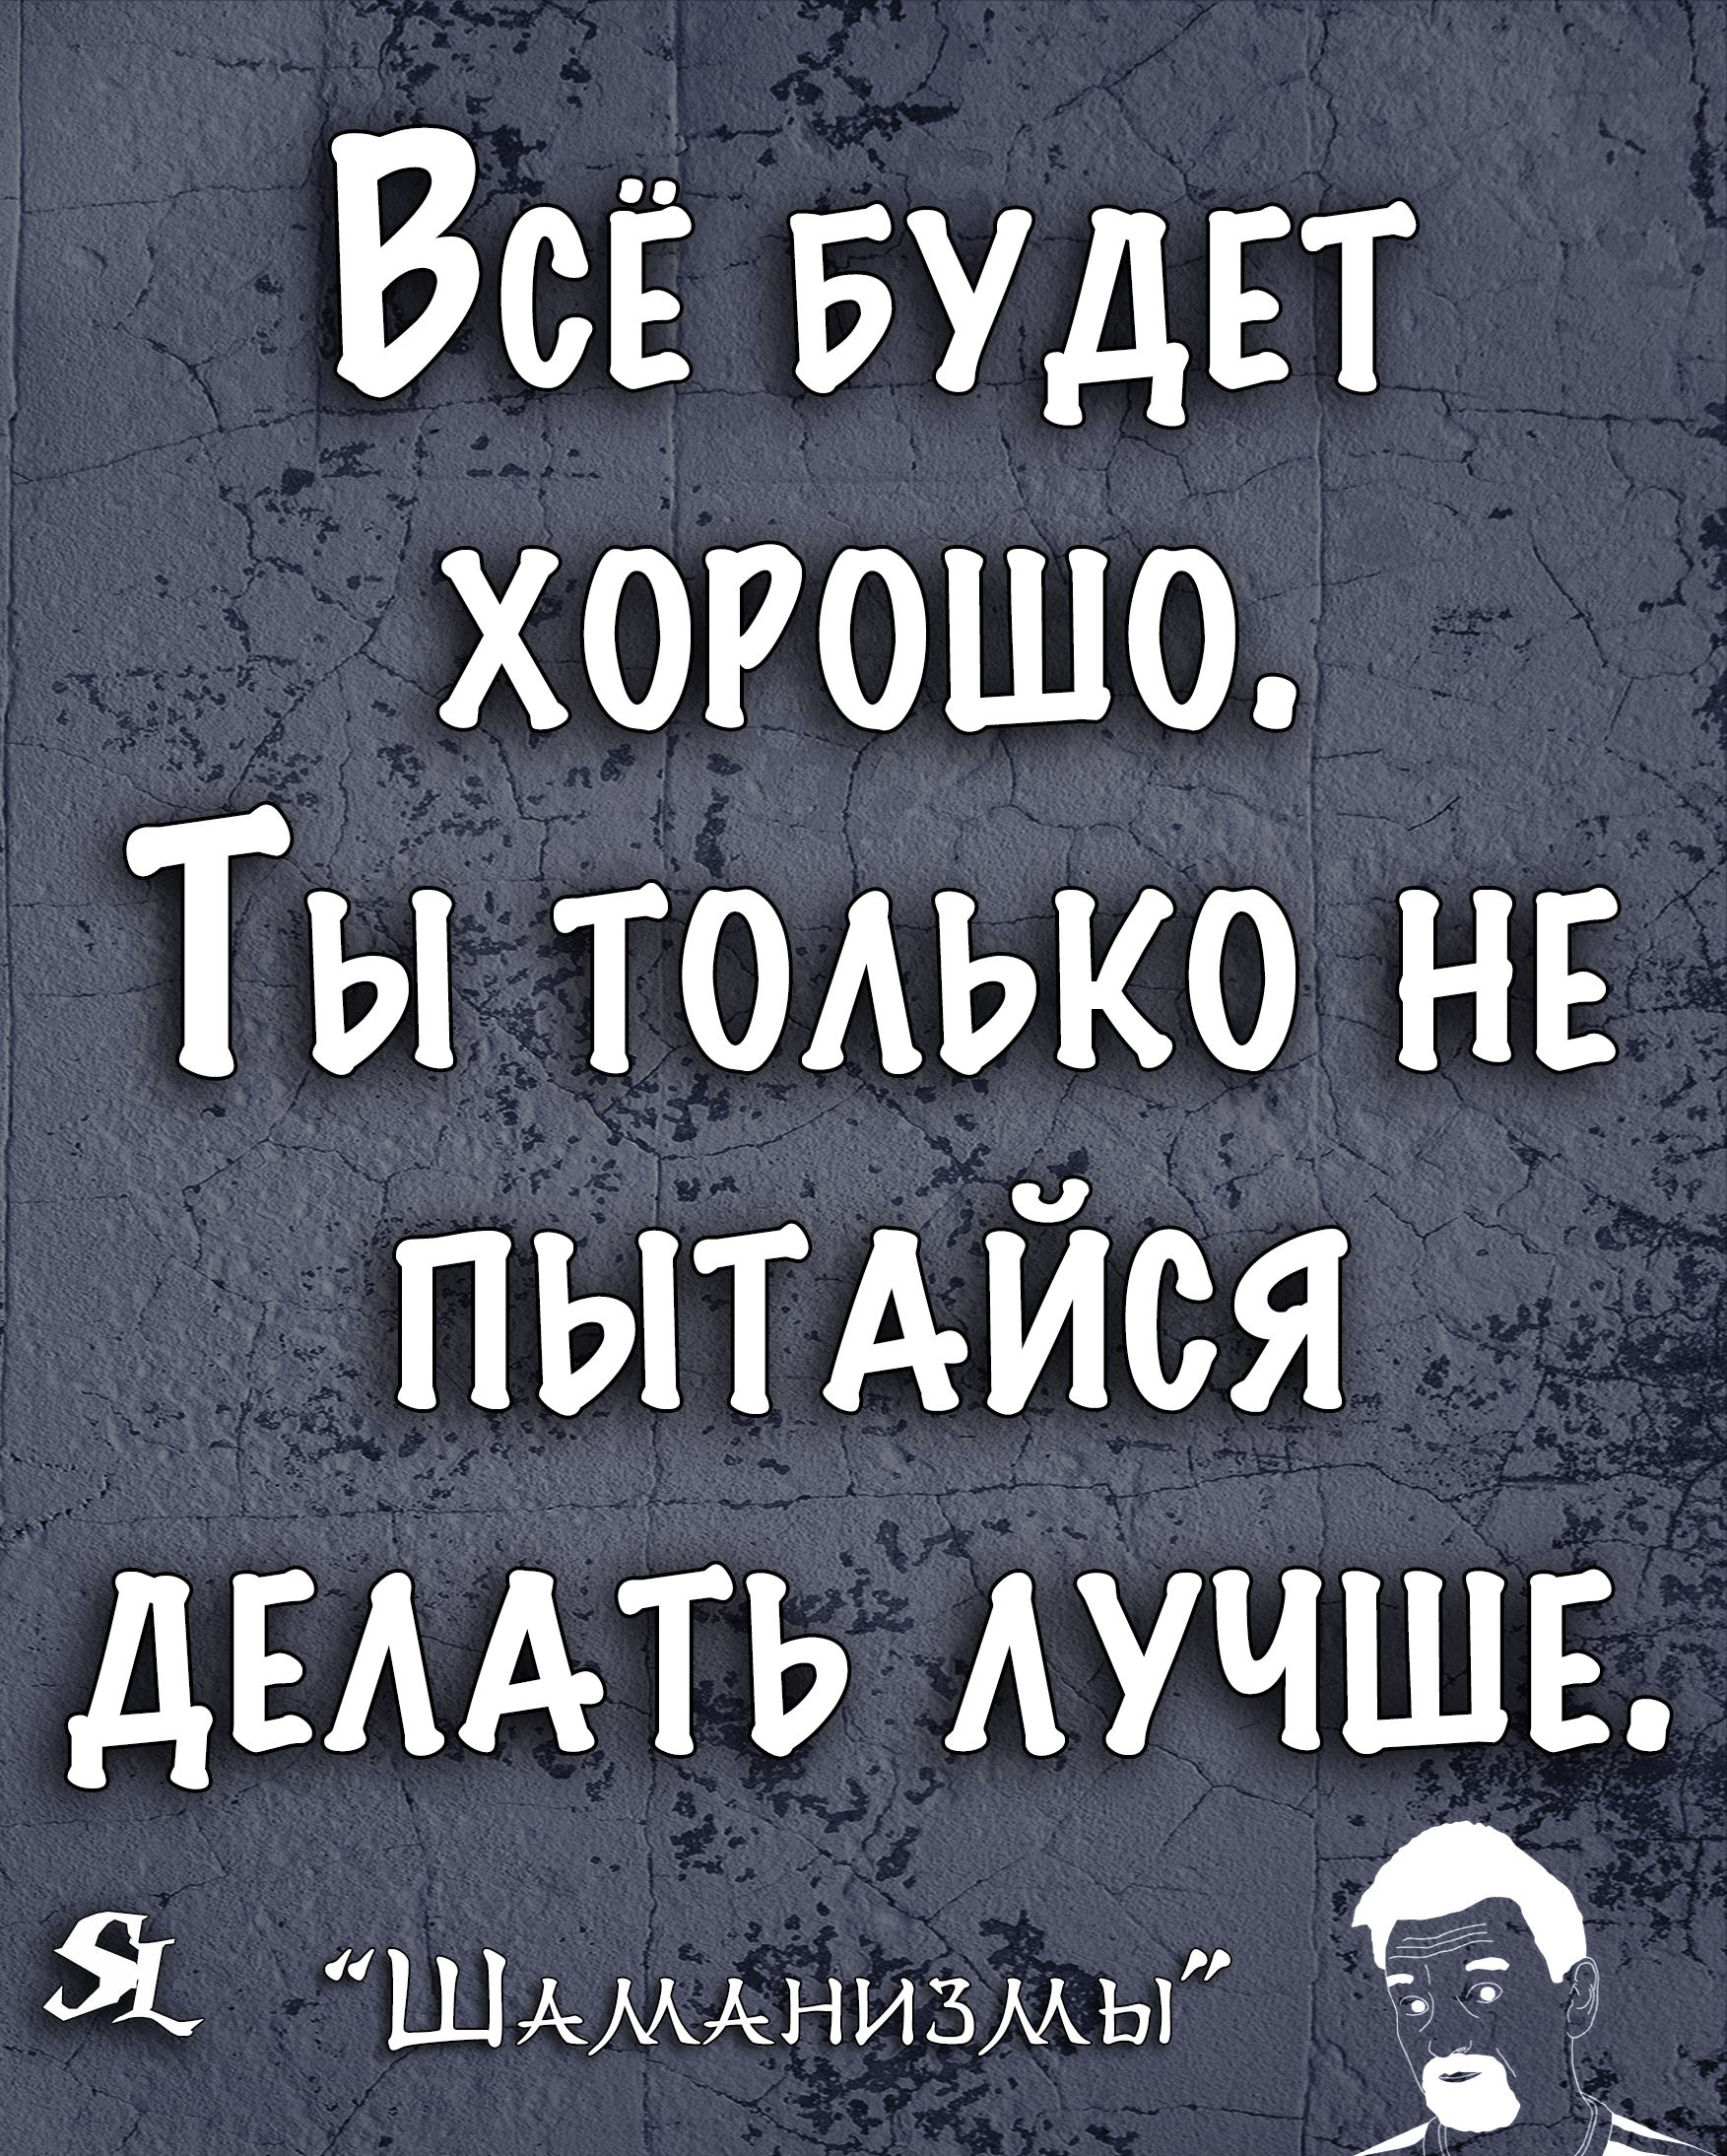 Shamanizmy Shutki Prikol Yumor Jokes Funny Humor Memes A Life Chistes El Humor Memes La Vida Gracioso Citaty Vdohnovlyayushie Citaty Motivaciya